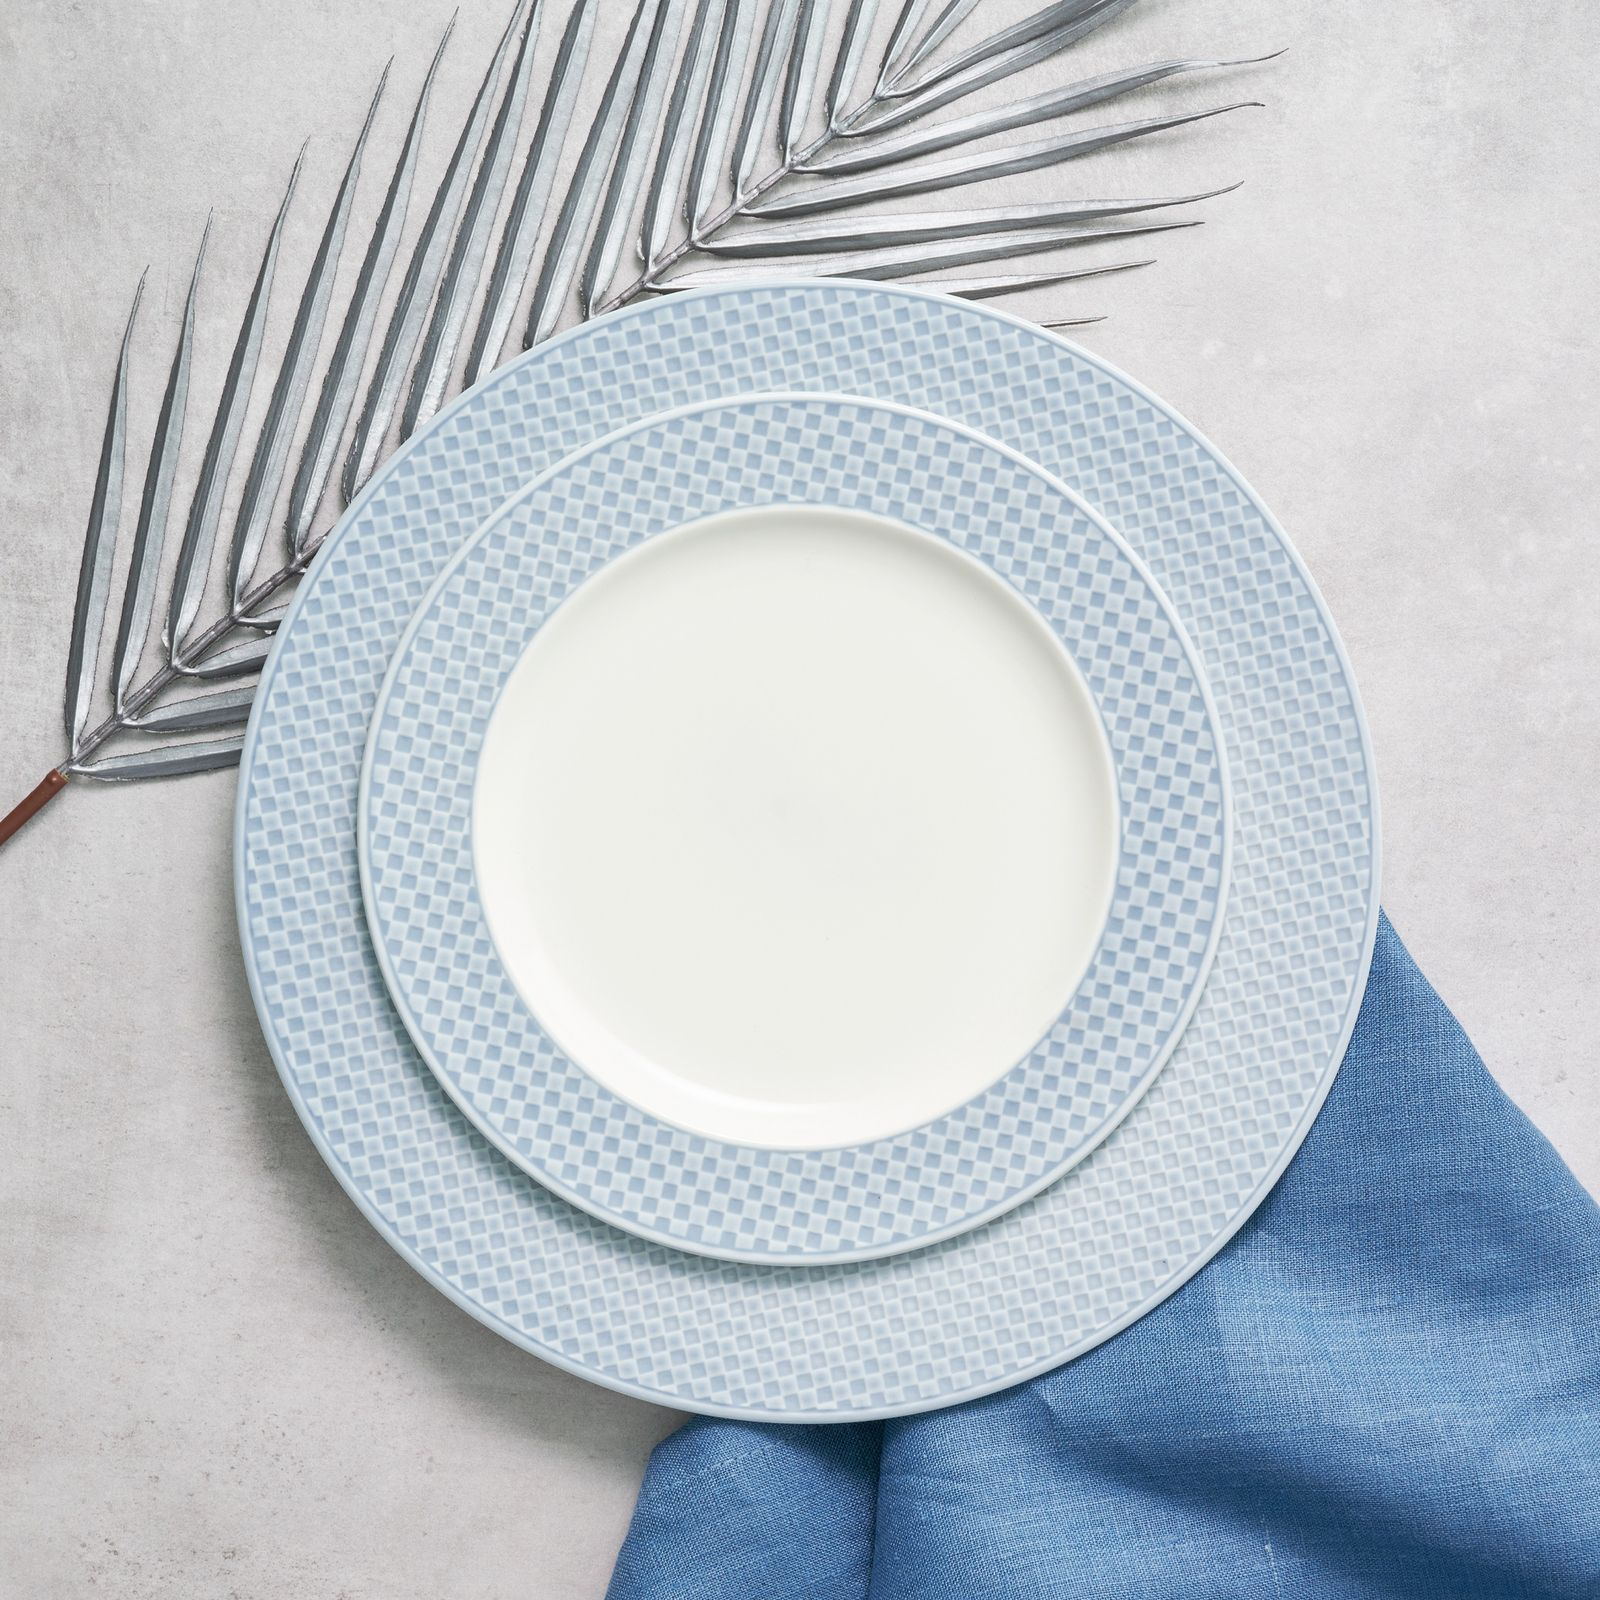 Talerz deserowy Nordic 21,5 cm niebieski AMBITION